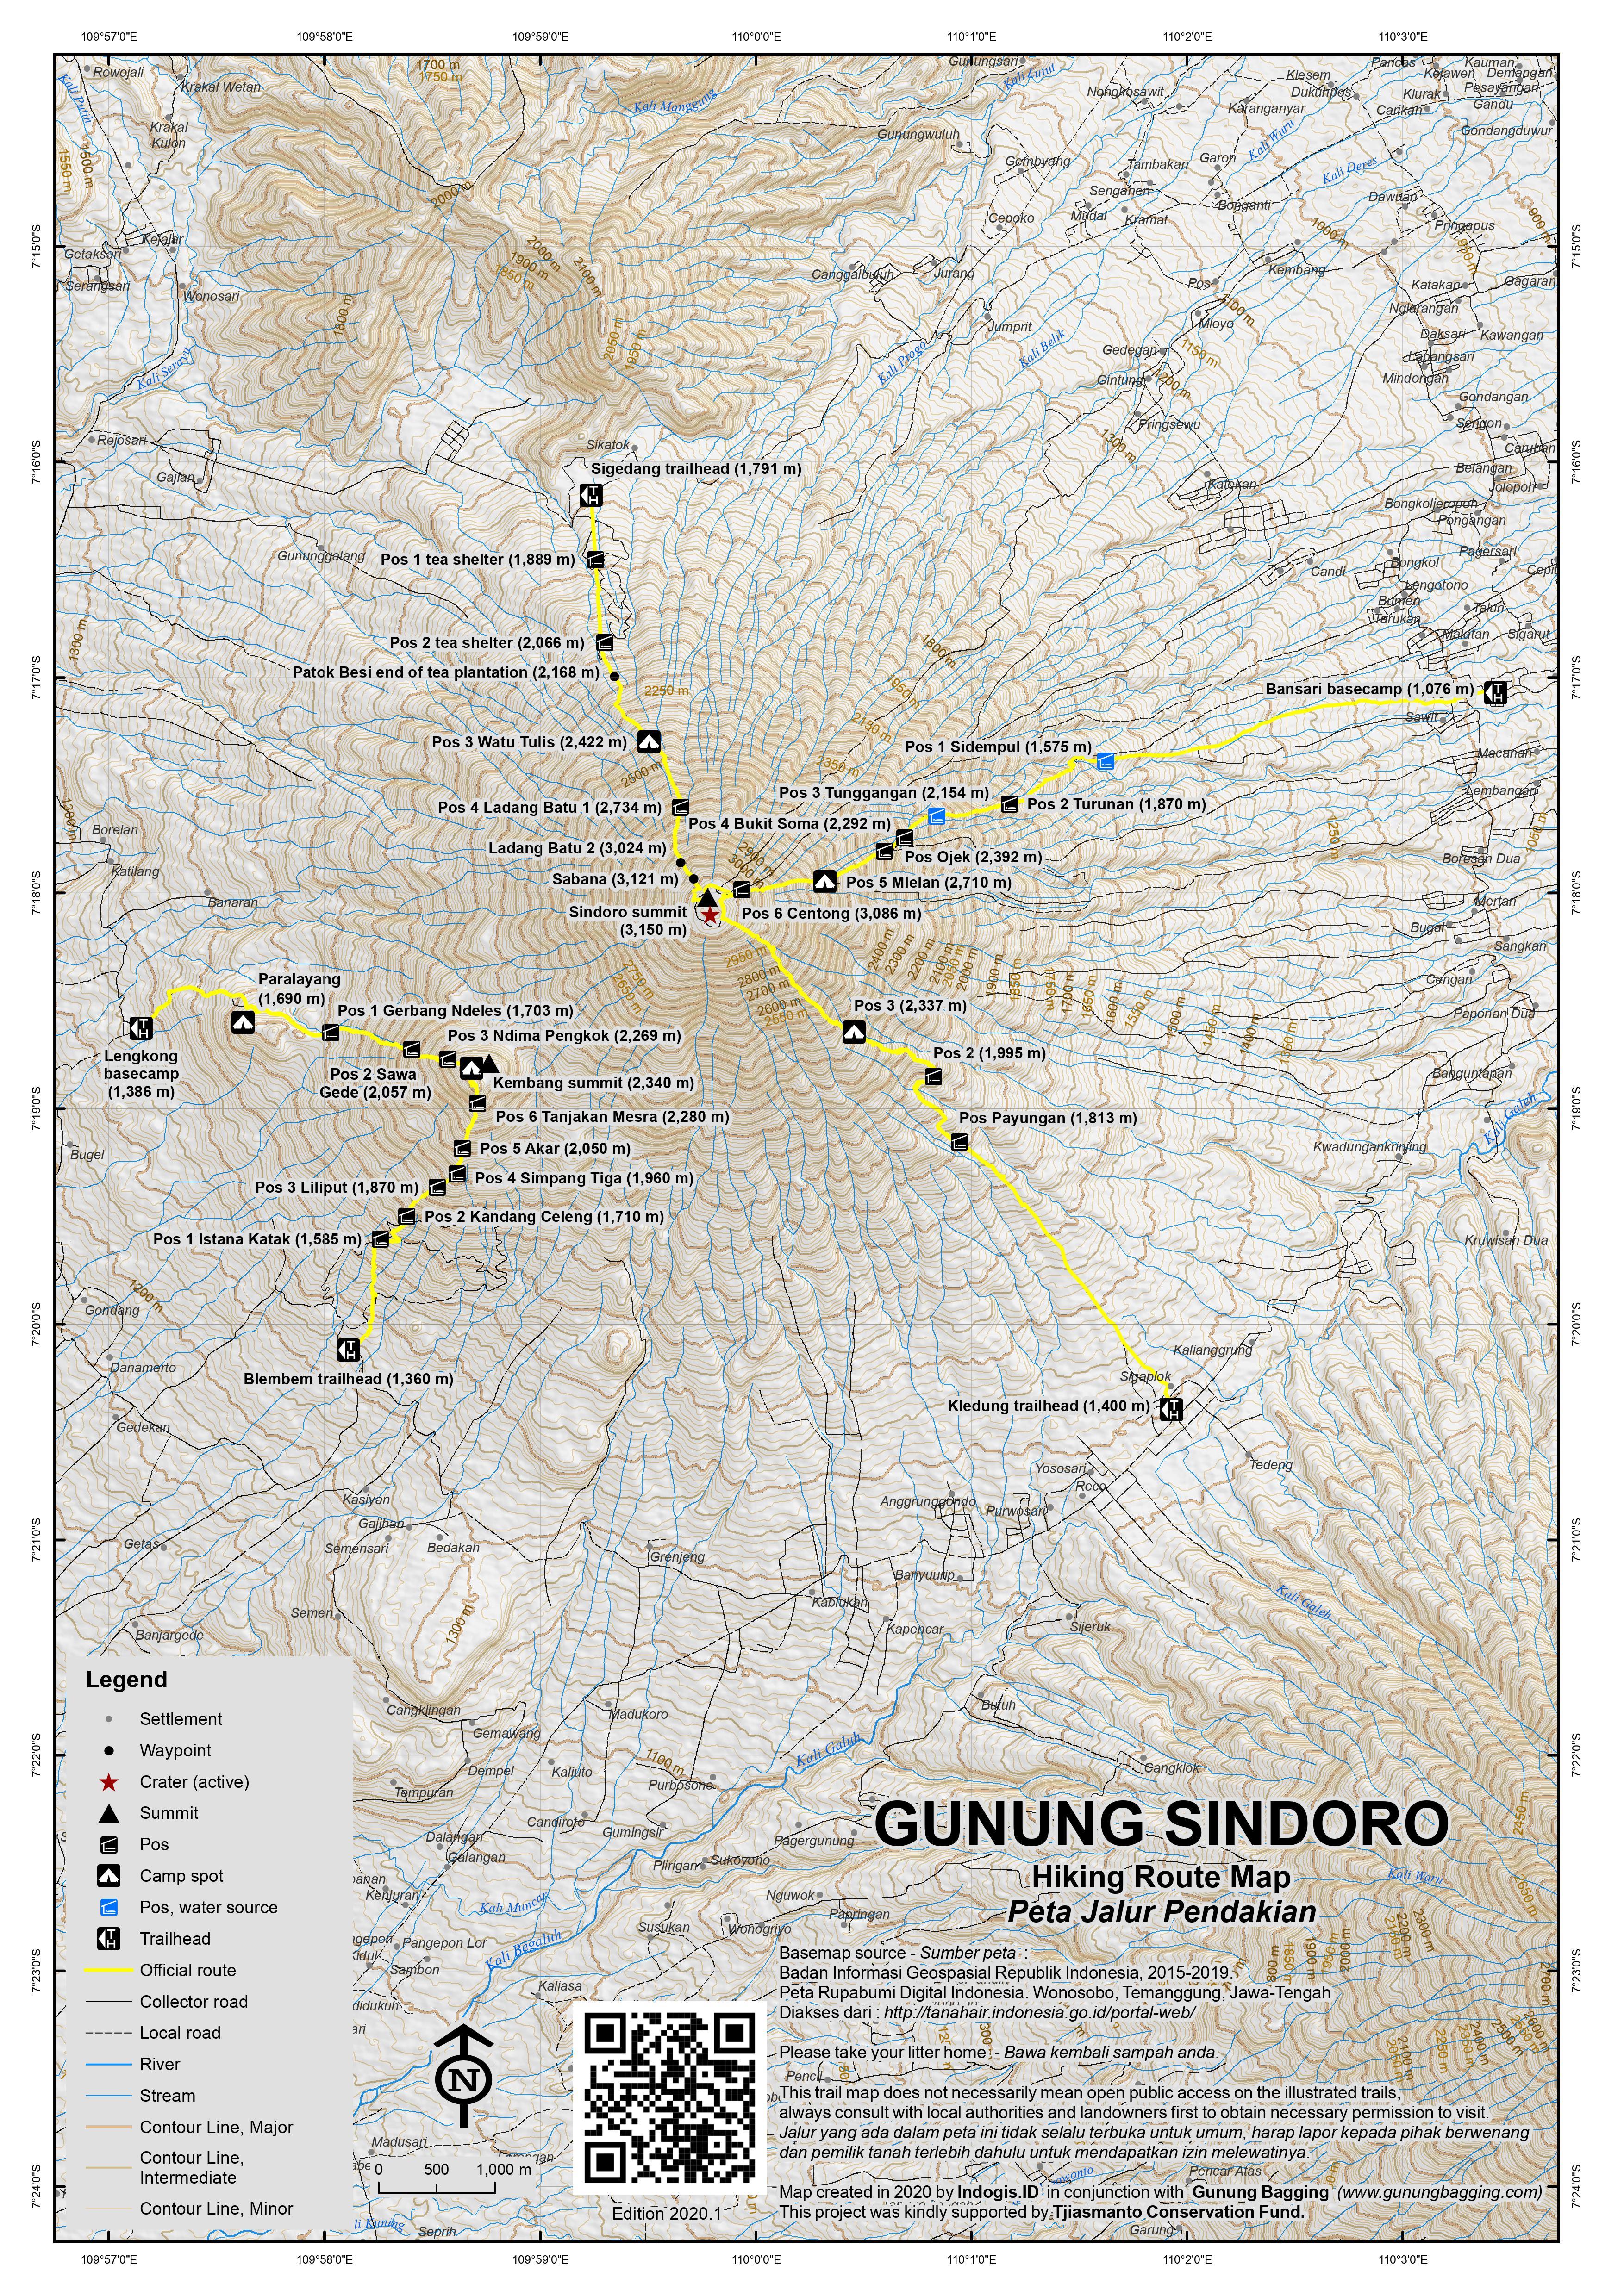 Peta Jalur Pendakian Gunung Sindoro